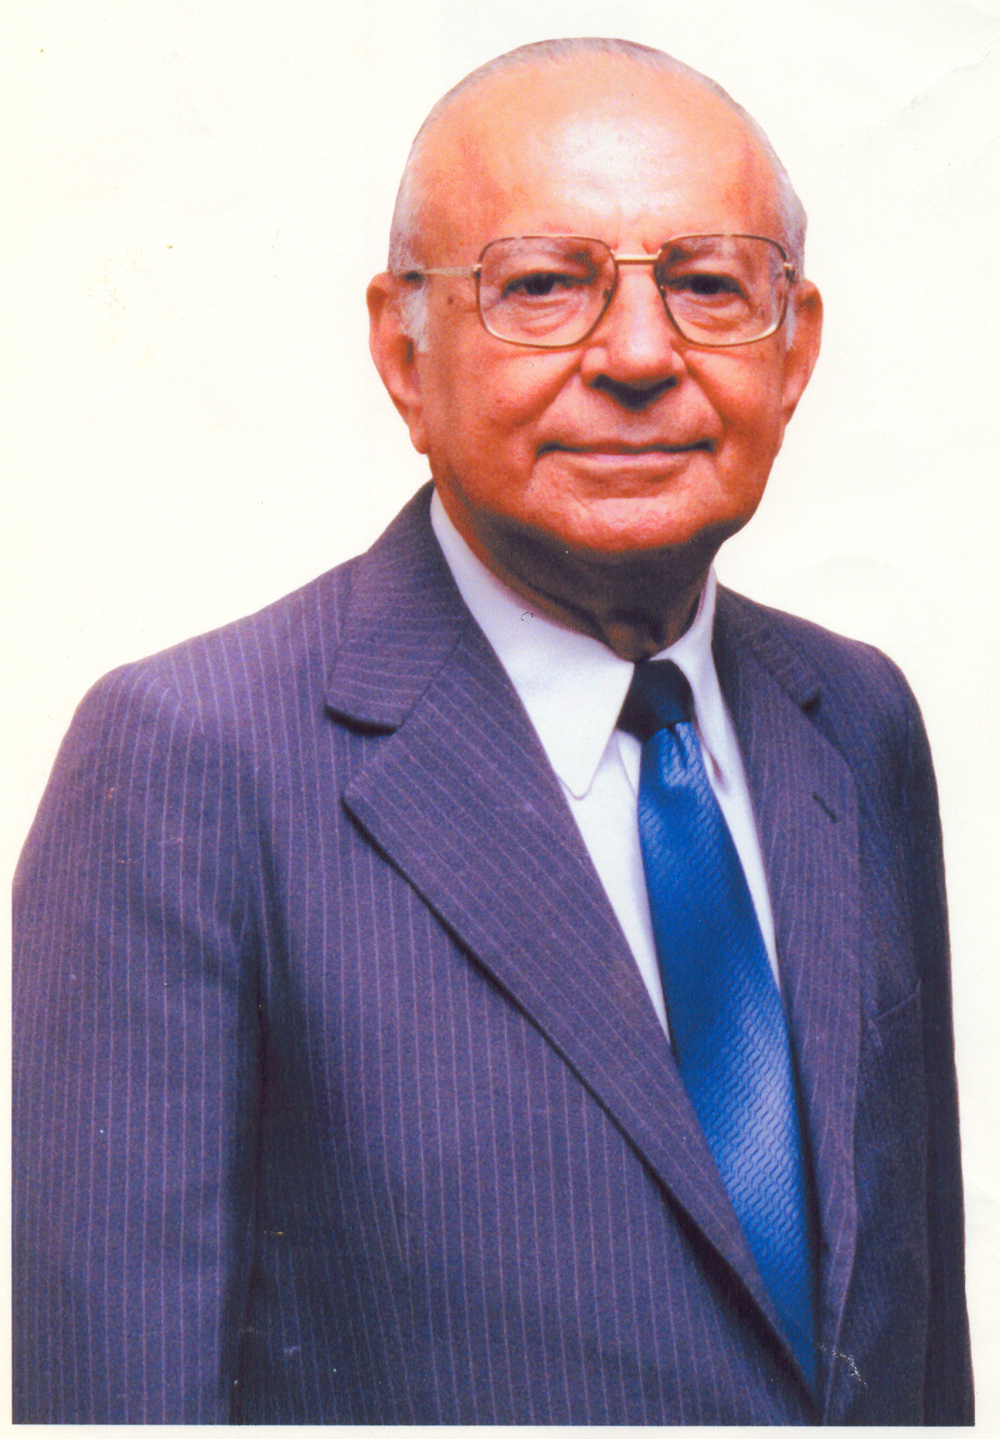 Professor Samuel Benchimol